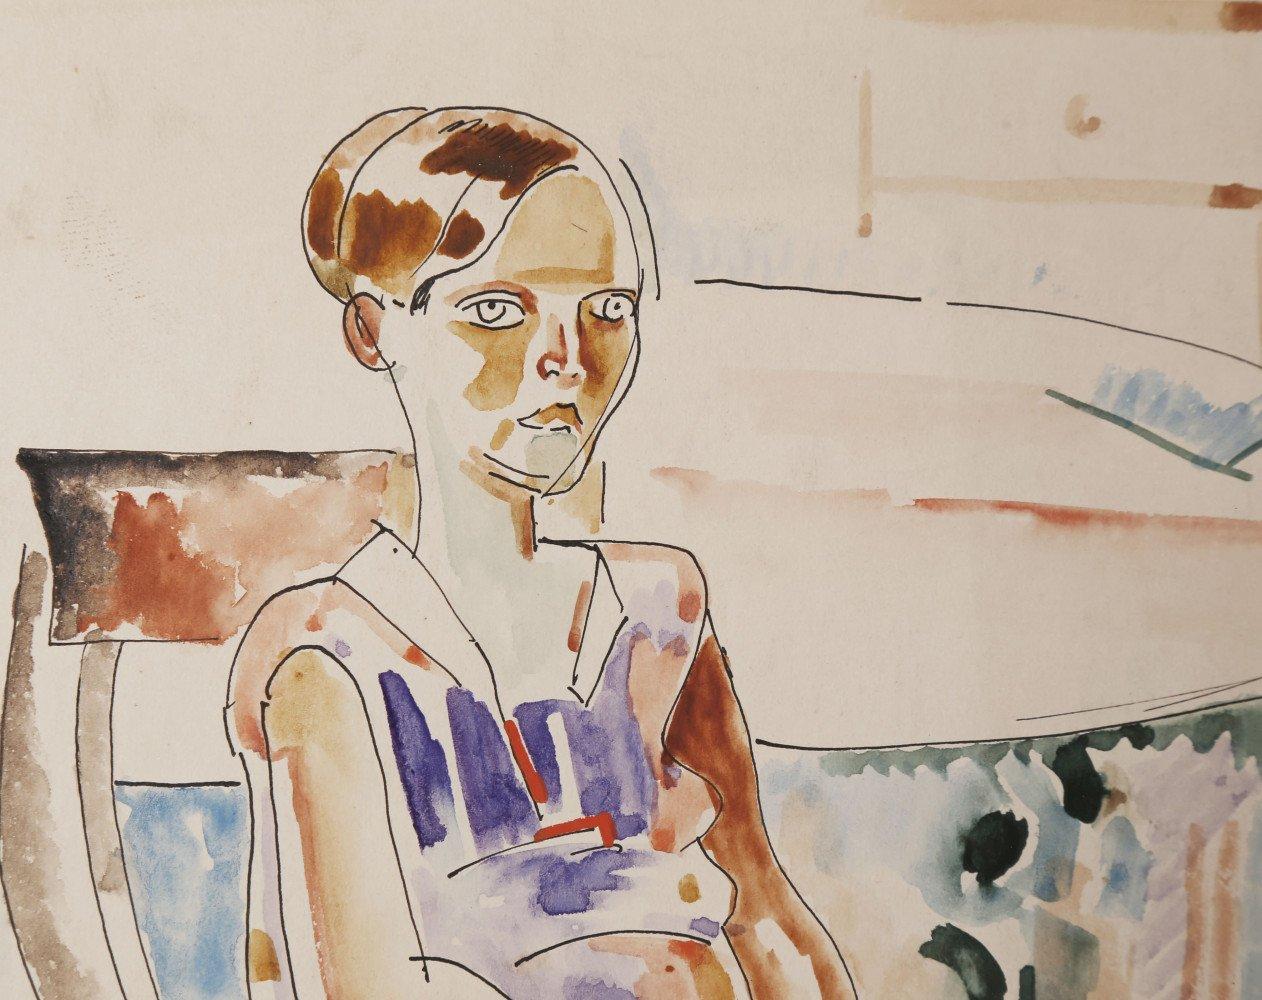 Tired Feet (Portrait of Tess Dominski) by William Sommer